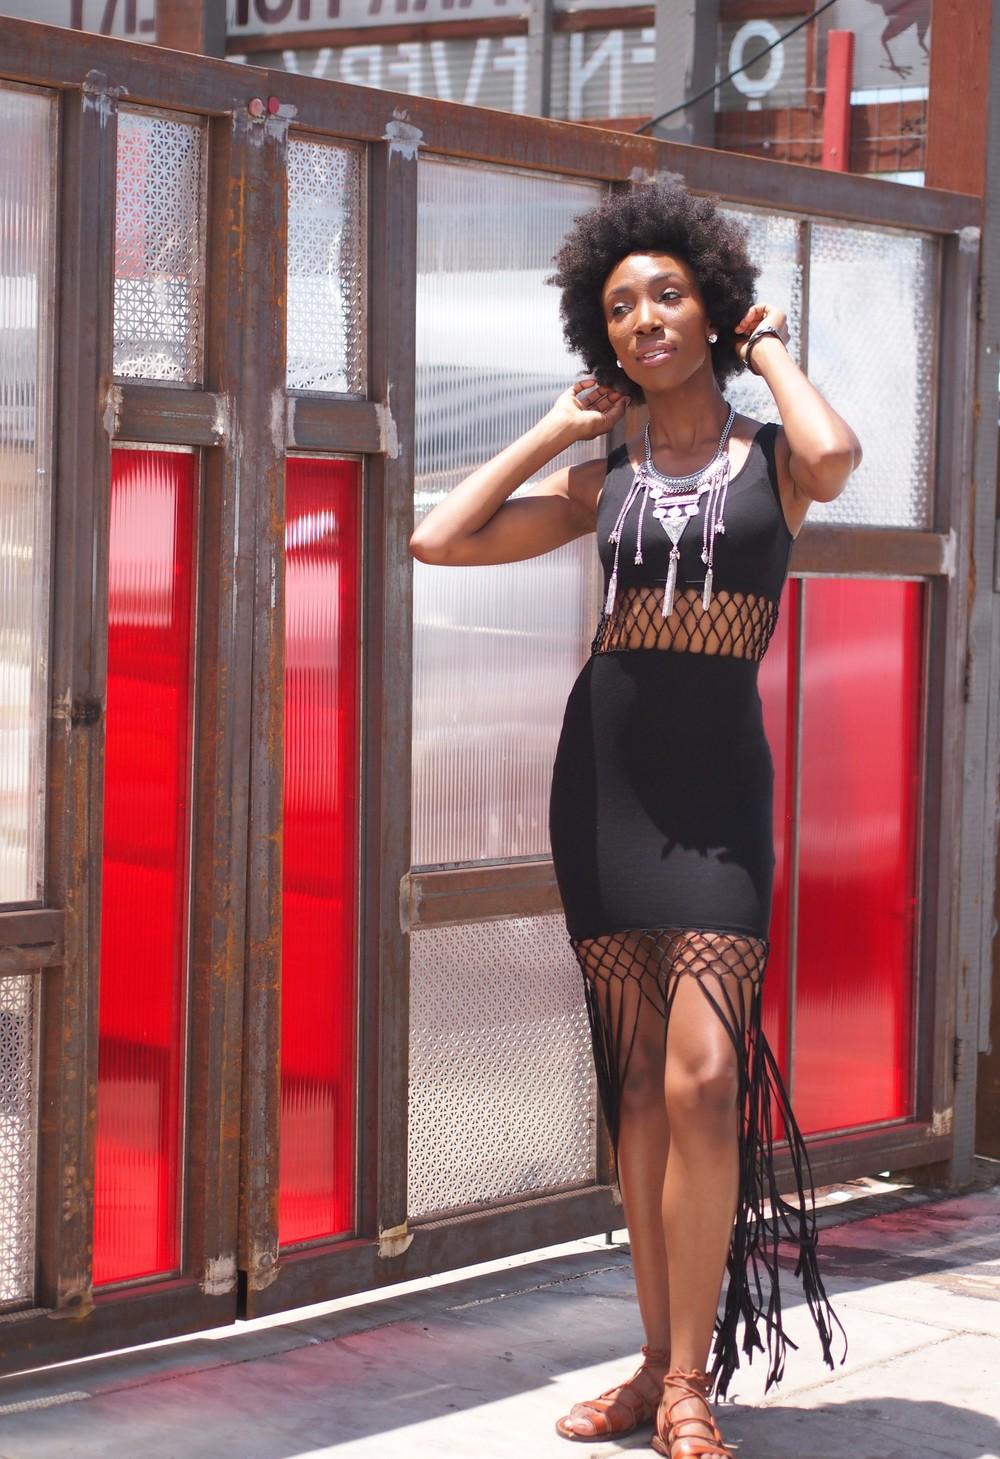 Dress:  H&M   Necklace:  Miss Match   Sandals:  Target